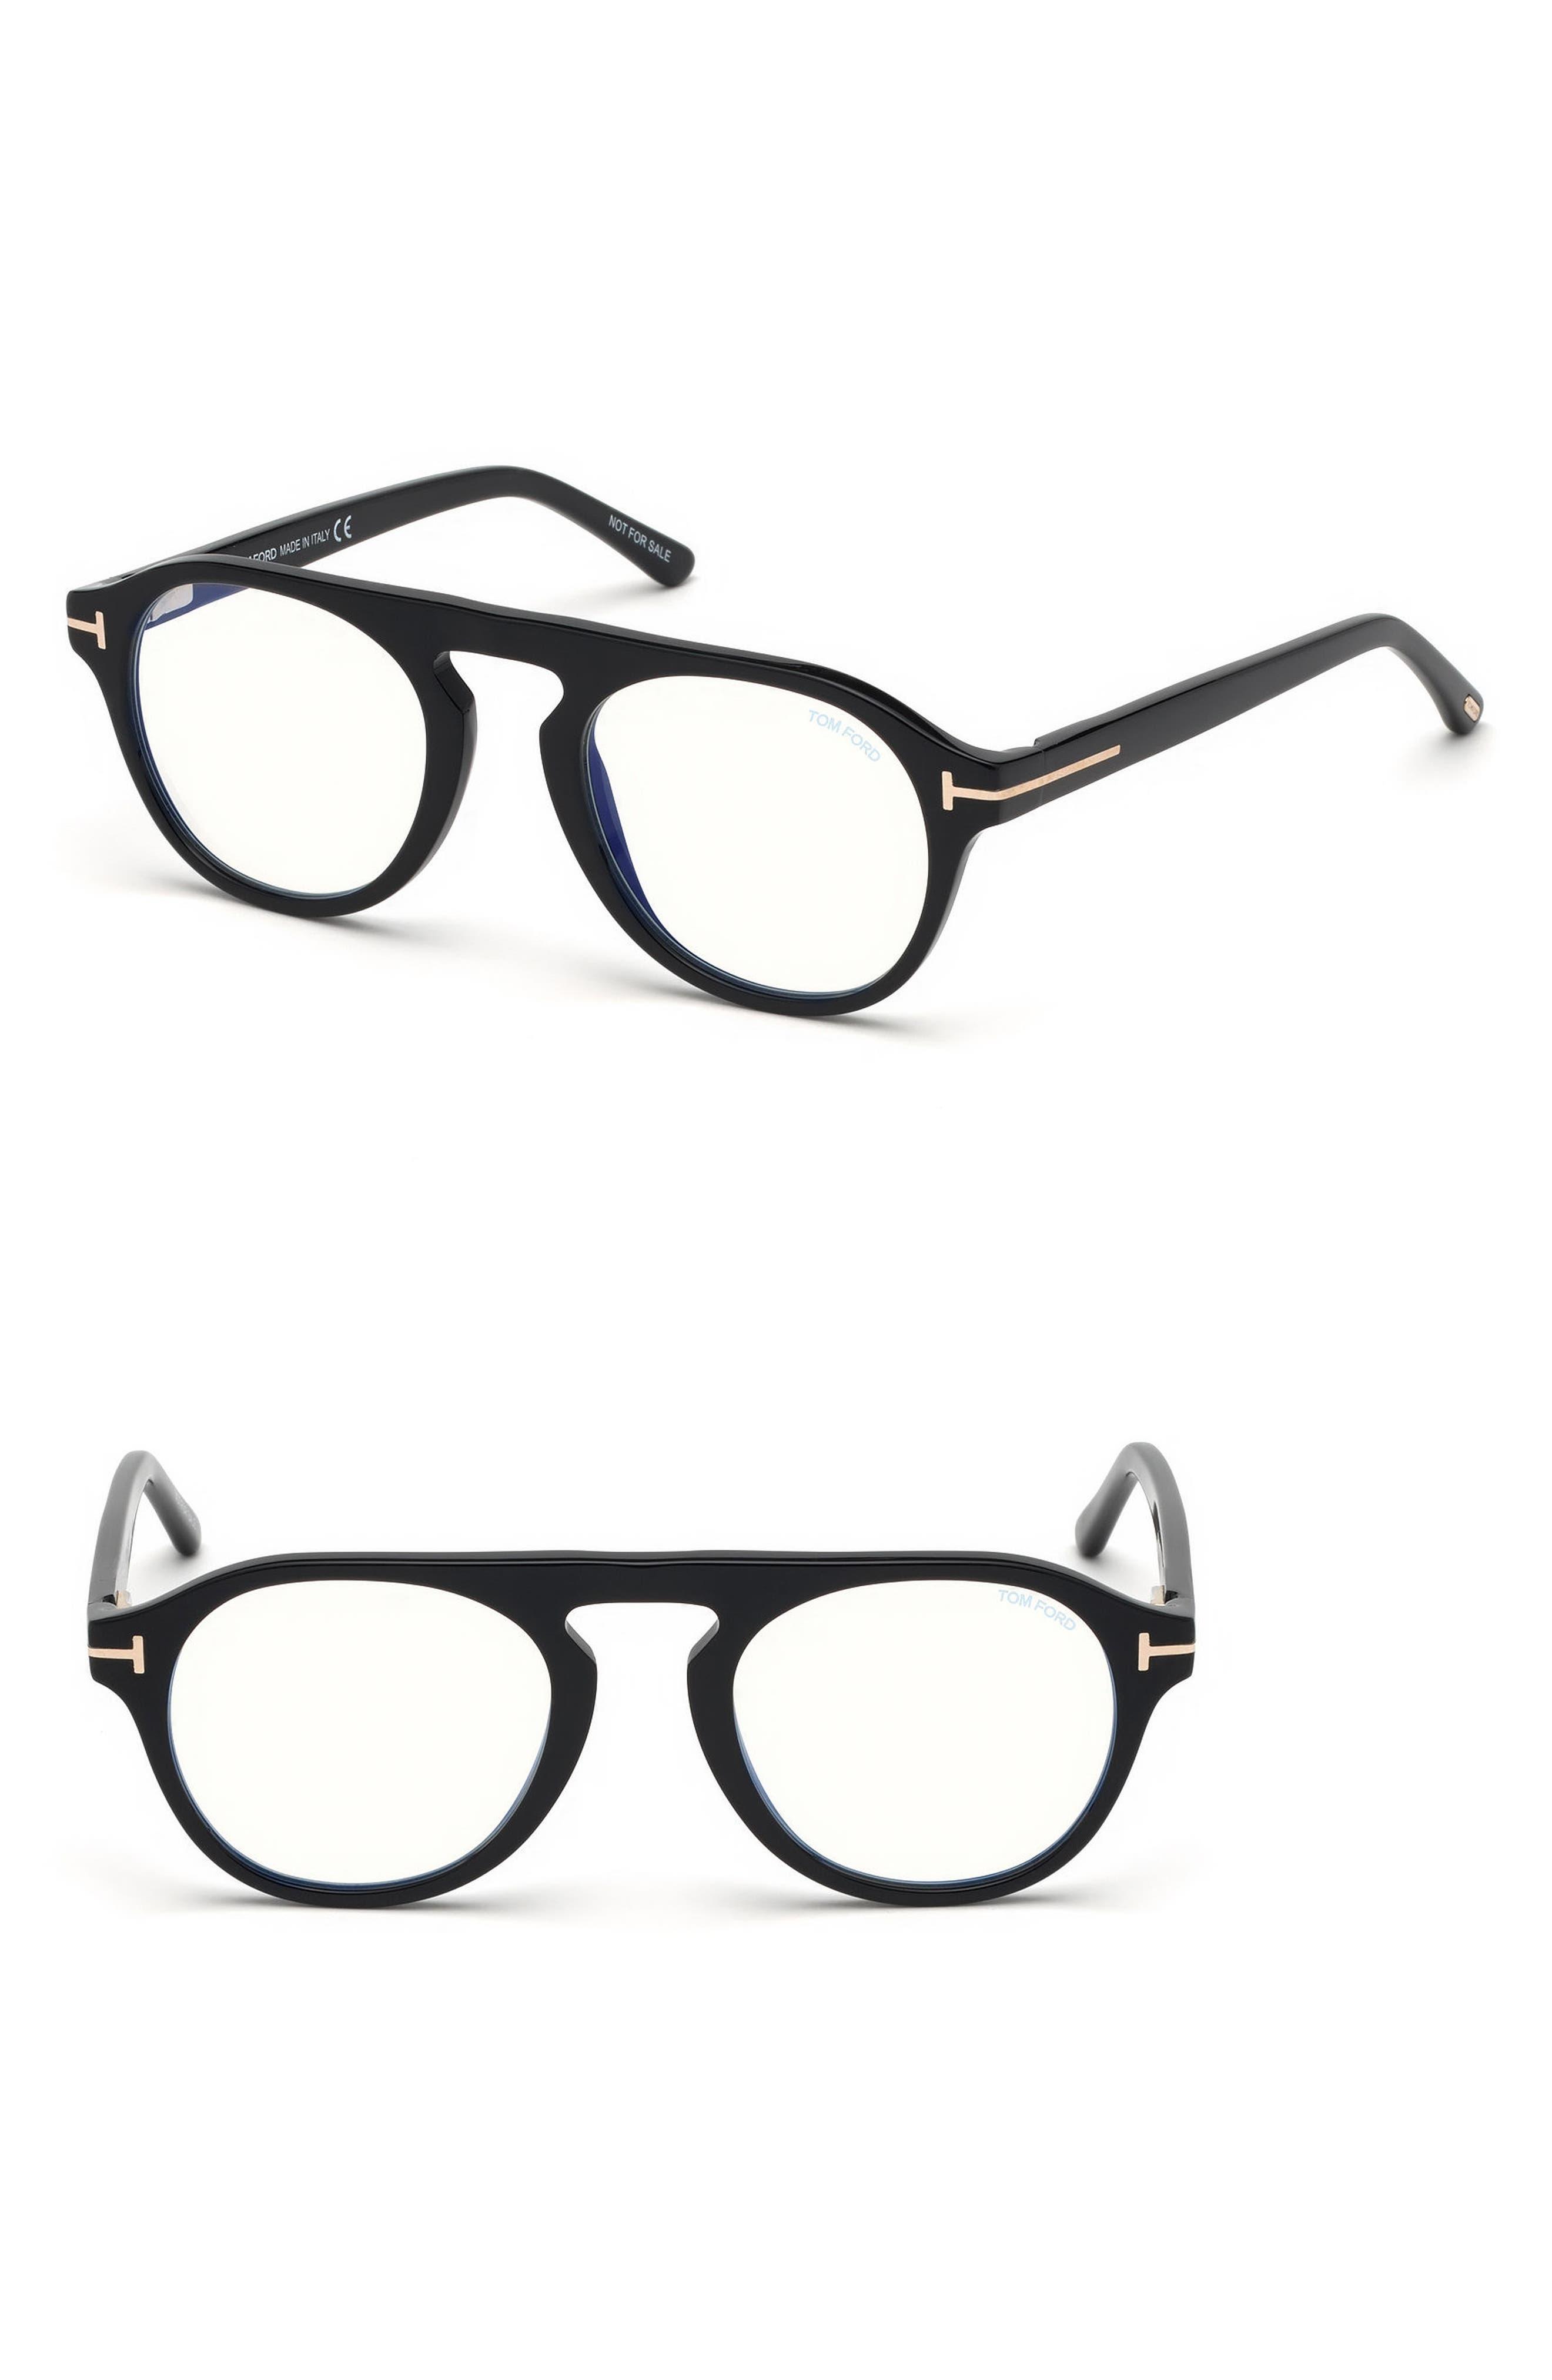 Blueblock 49mm Sunglasses with Clip-On Lens,                             Main thumbnail 1, color,                             BLACK